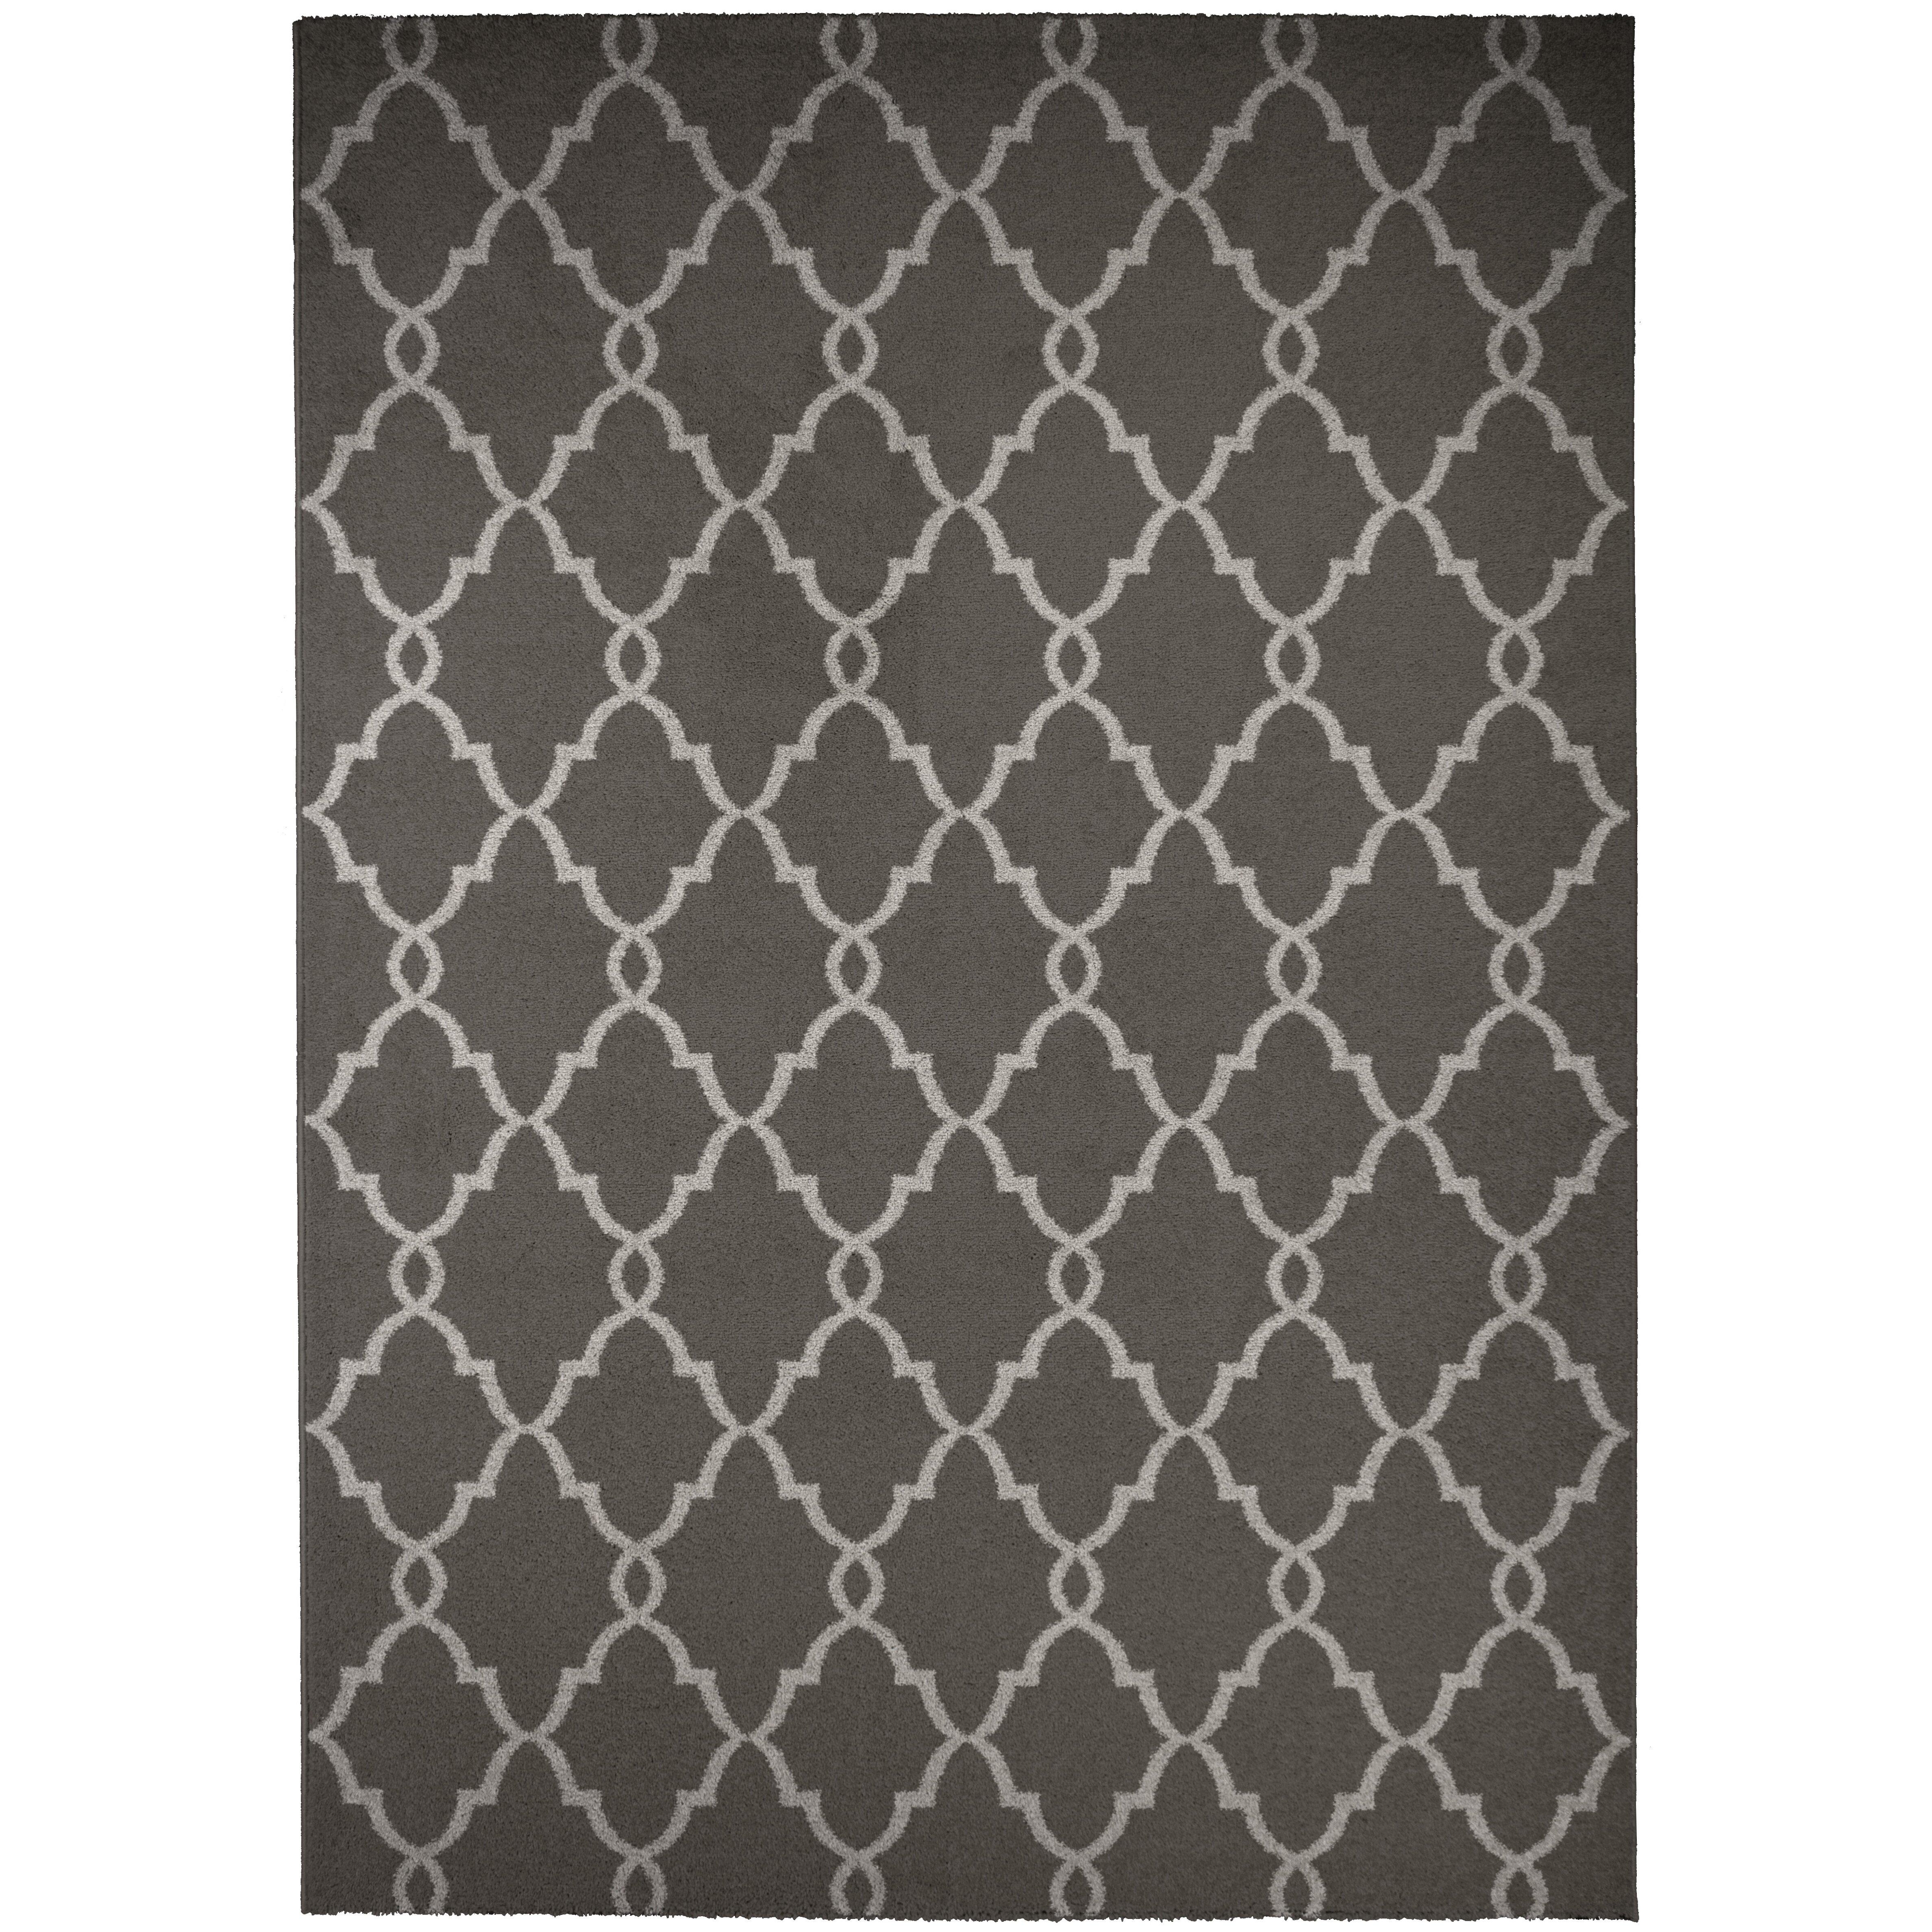 mcthree teppich aruba in grau bewertungen. Black Bedroom Furniture Sets. Home Design Ideas